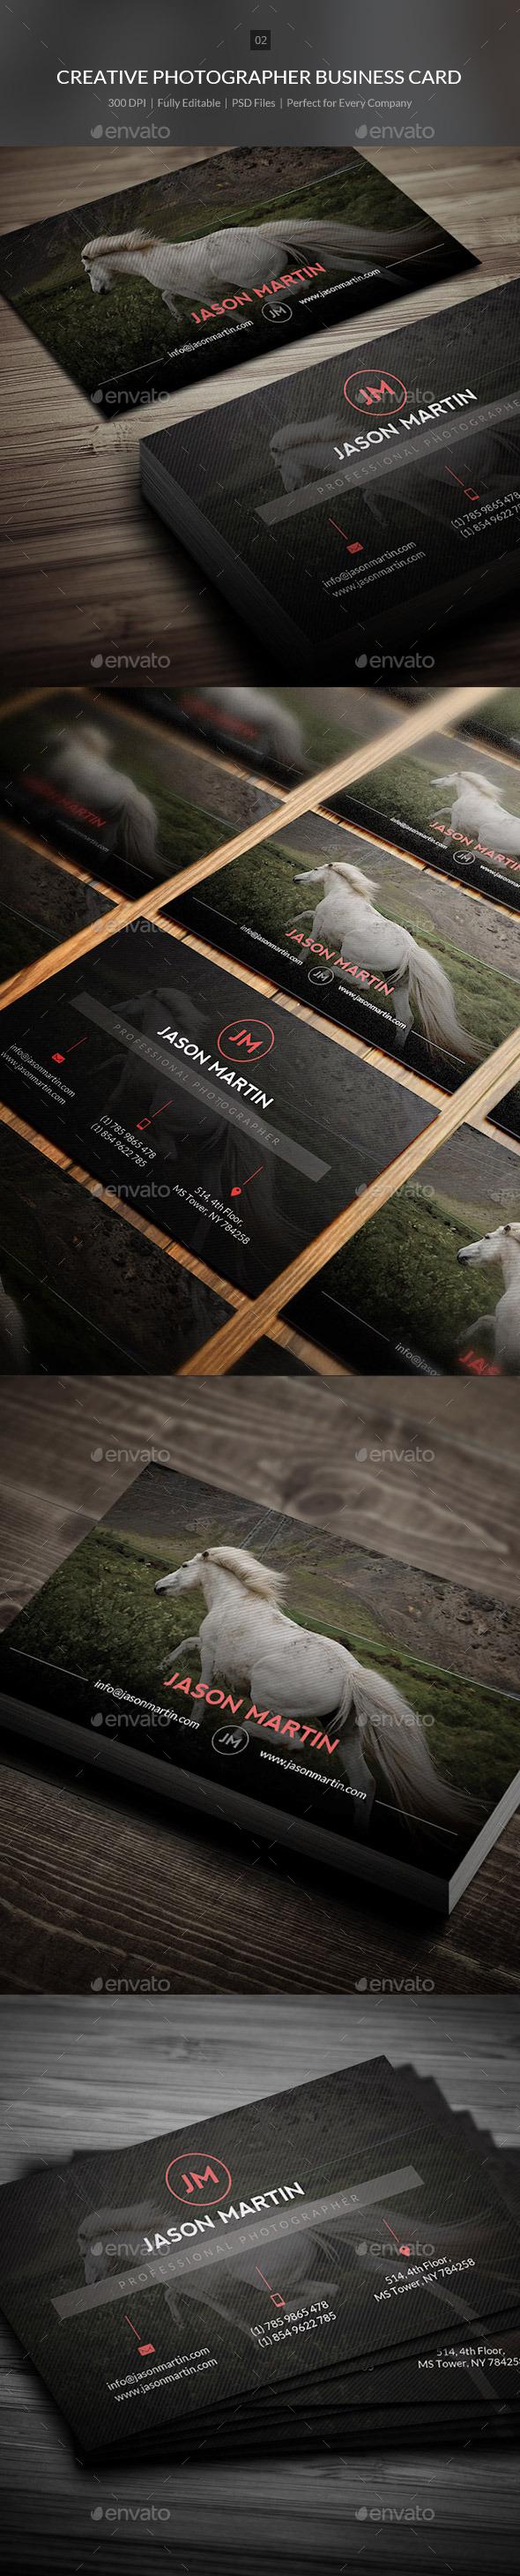 Creative Photographer Business Card - 02 - Creative Business Cards